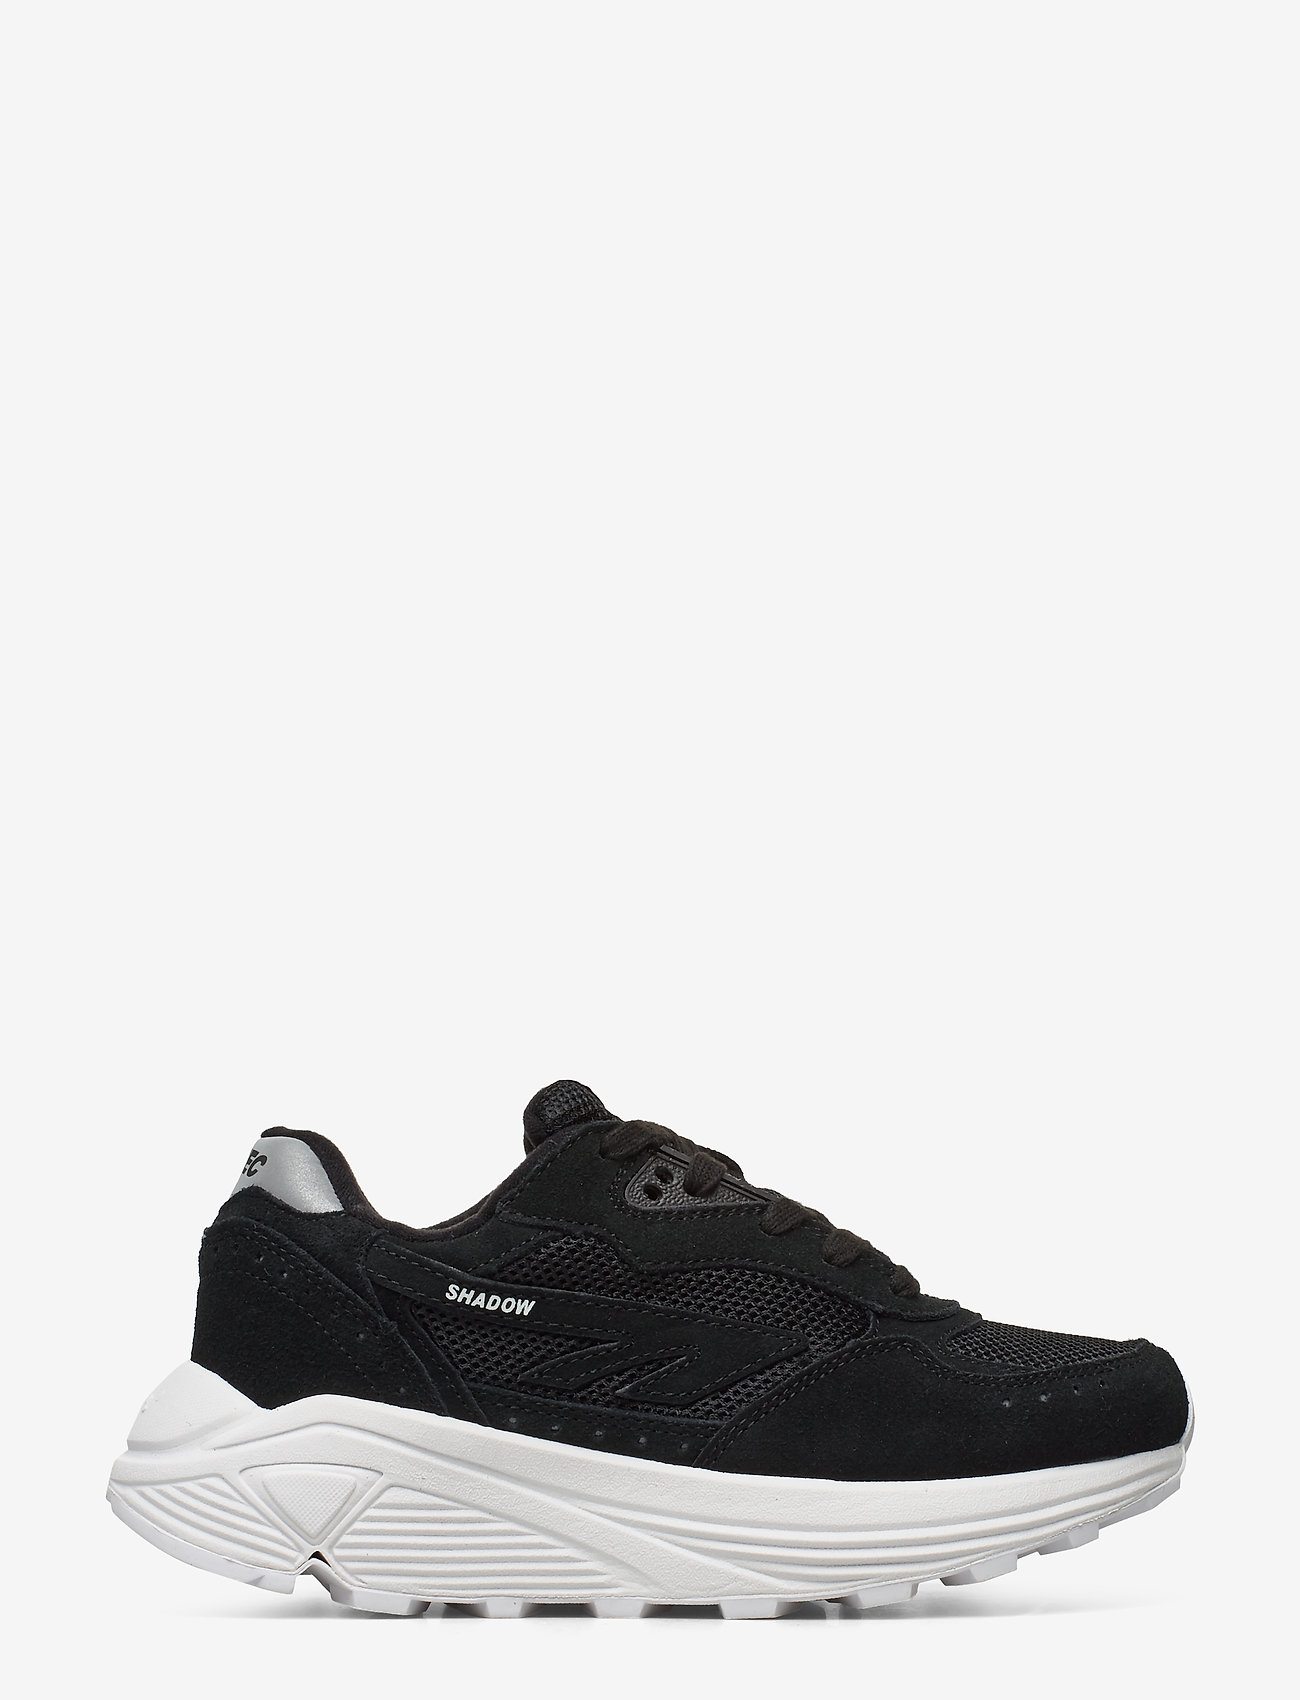 Hi-Tec HT SHADOW RGS CORE SUEDE BLACK/WHITE - Sneaker BLACK/WHITE - Schuhe Billige